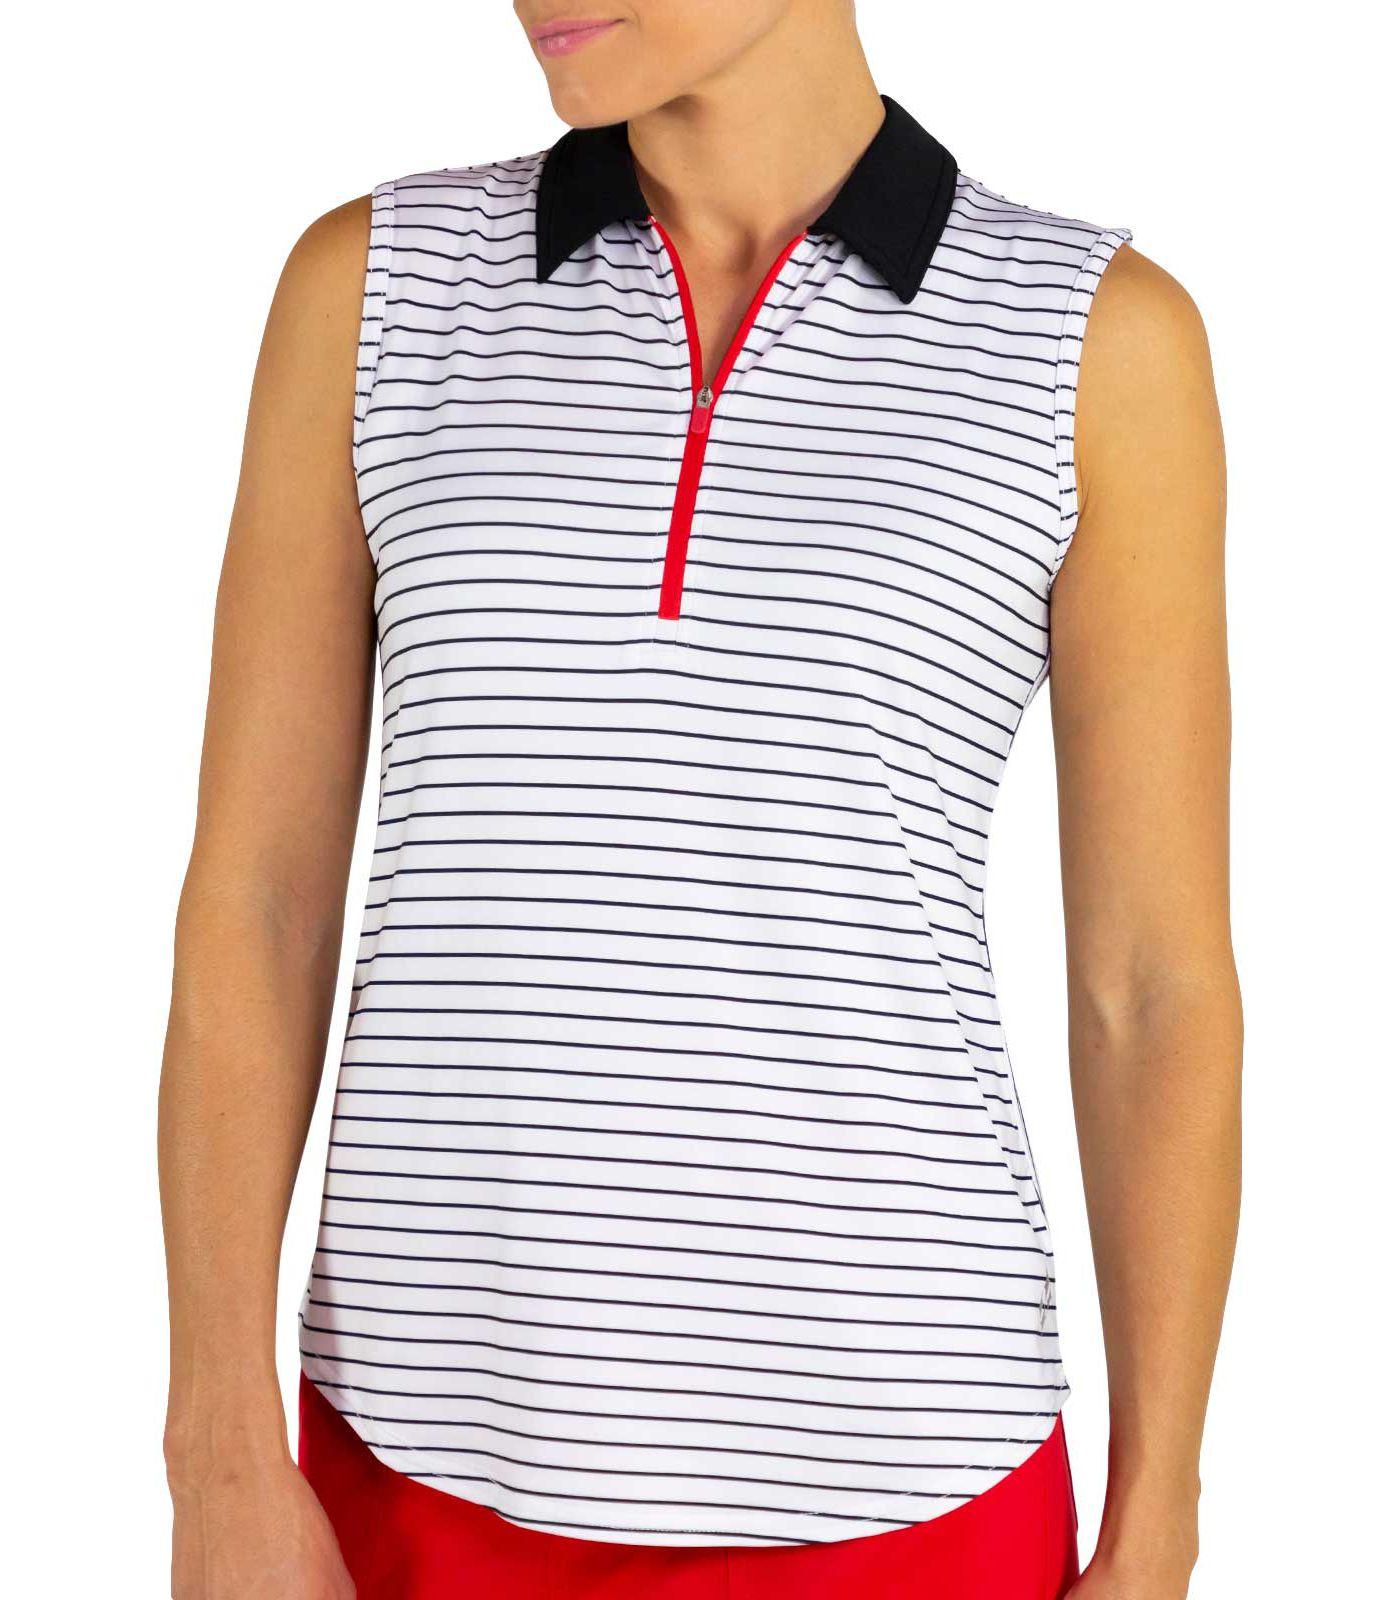 Jofit Women's Zip Sleeveless Golf Polo